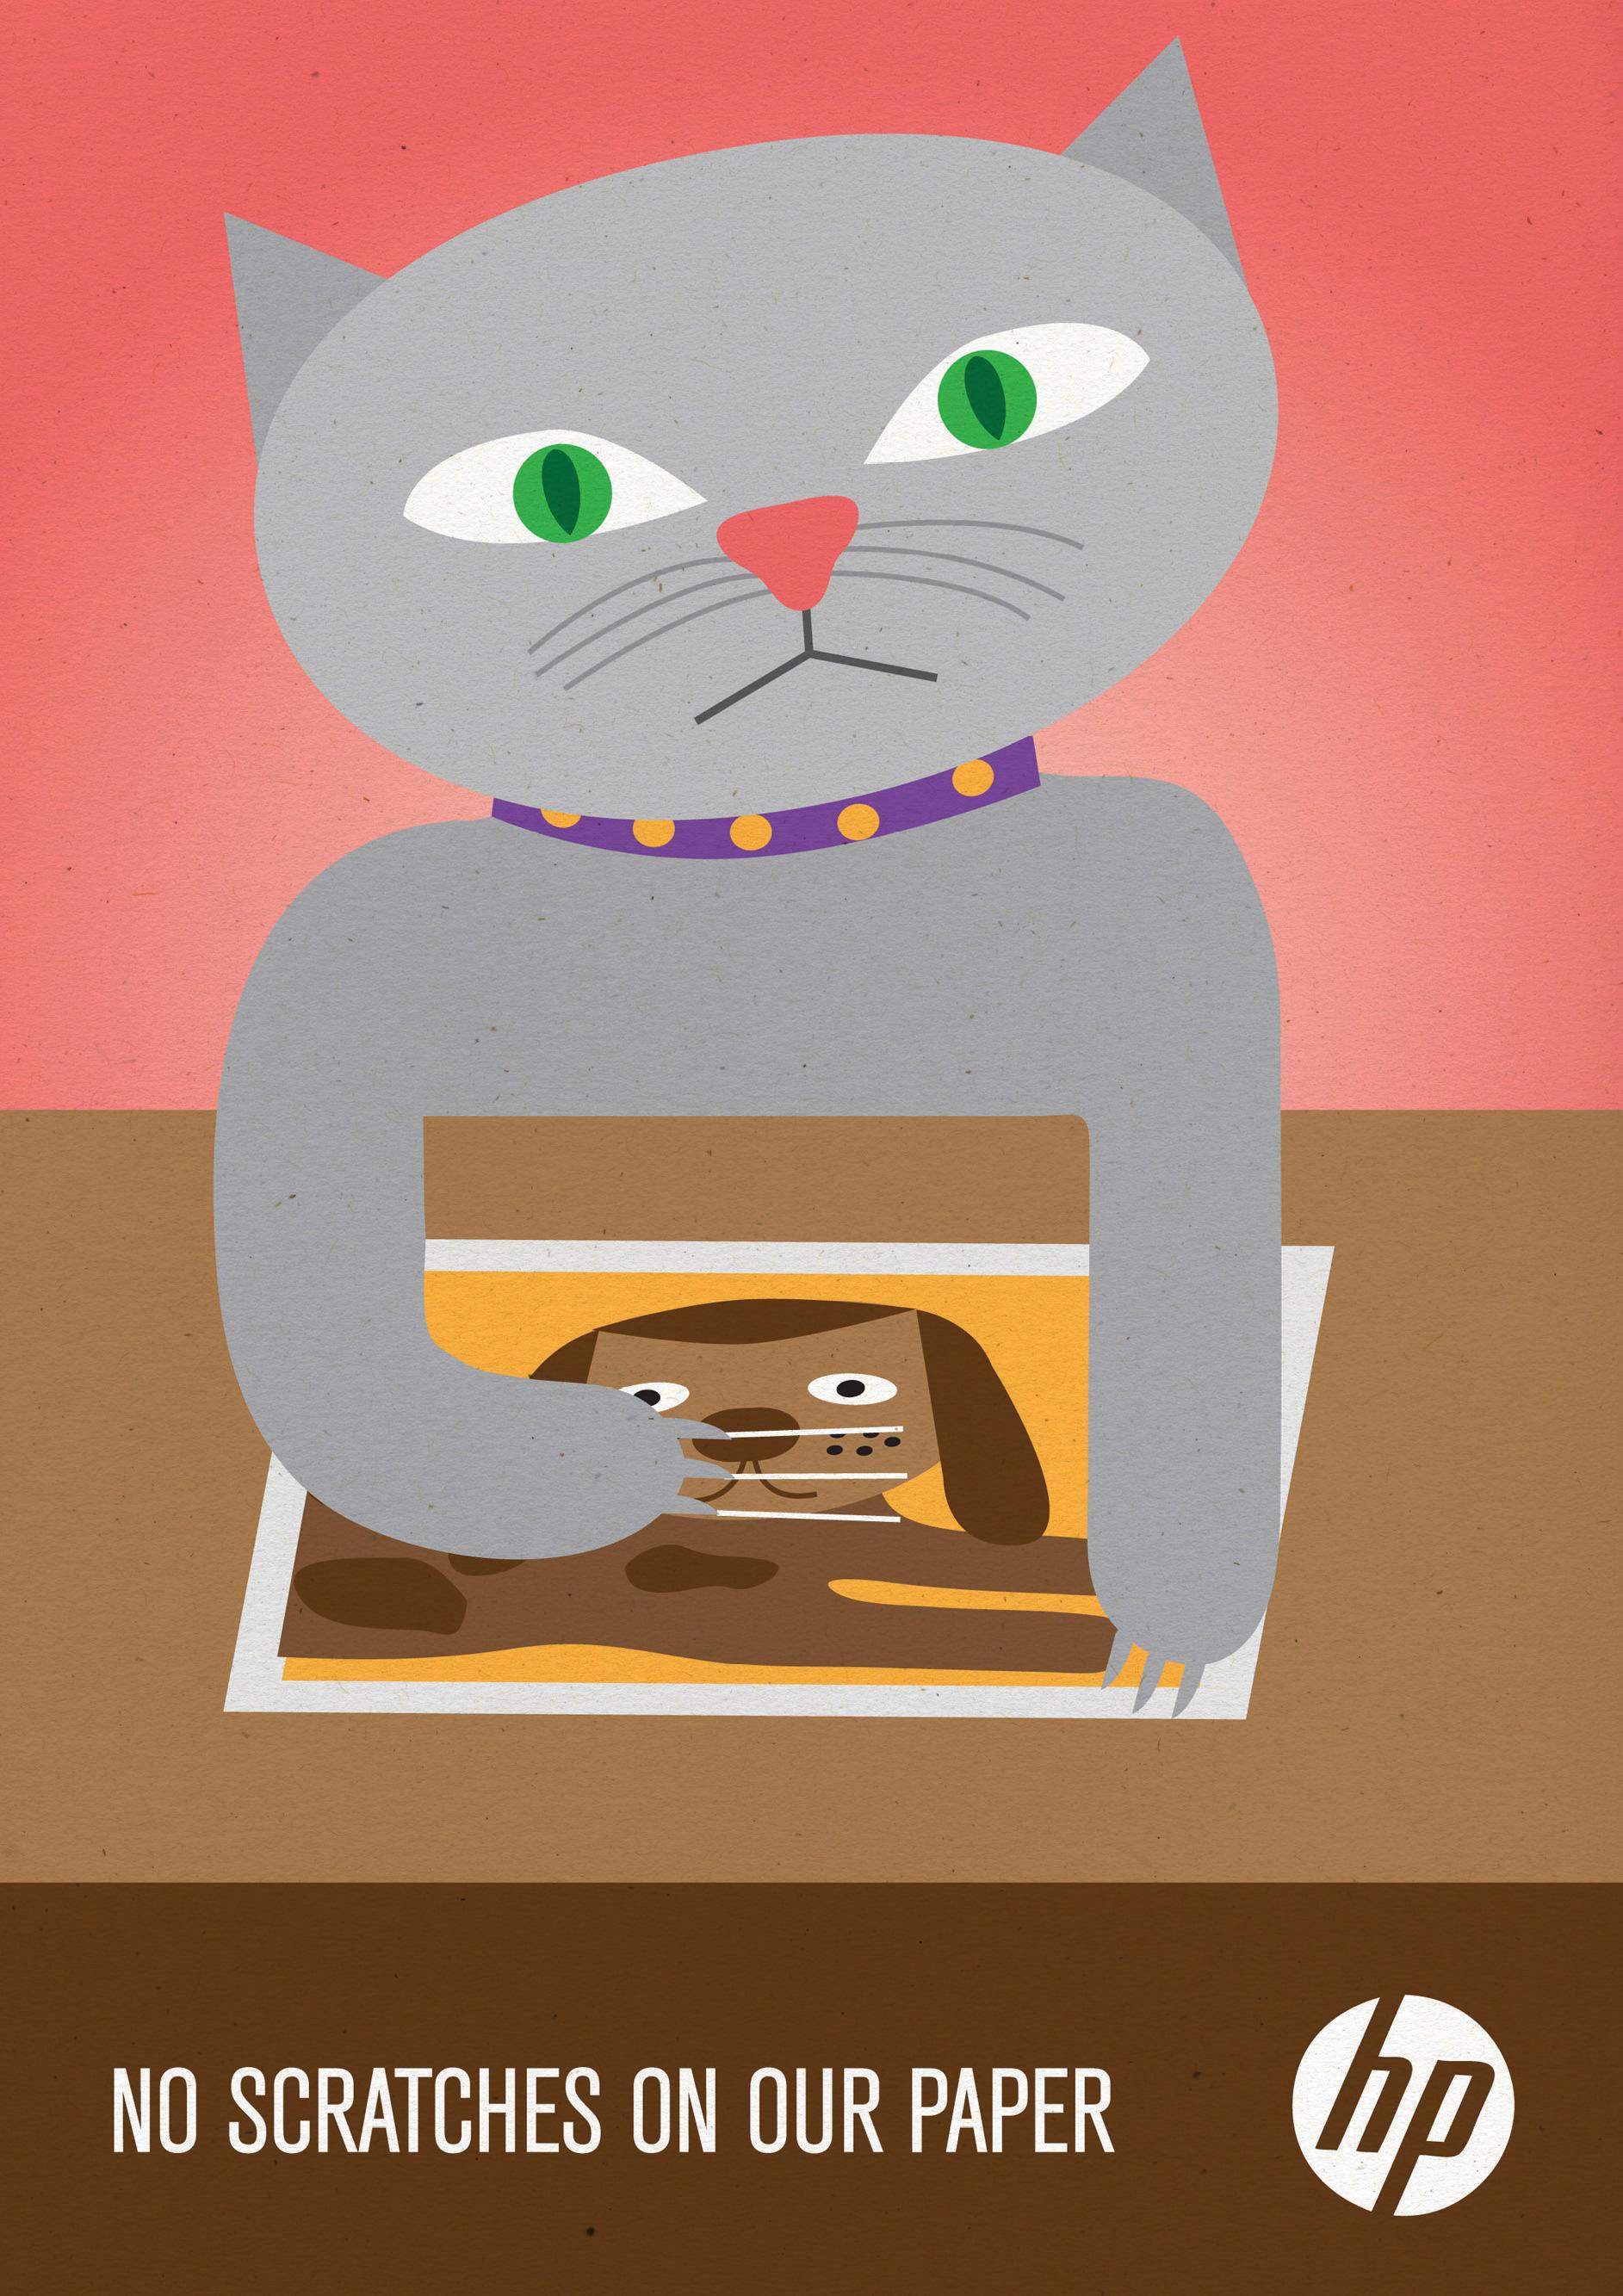 Marcus_Walters_Hewlett-Packard_Cat_WEB.jpg